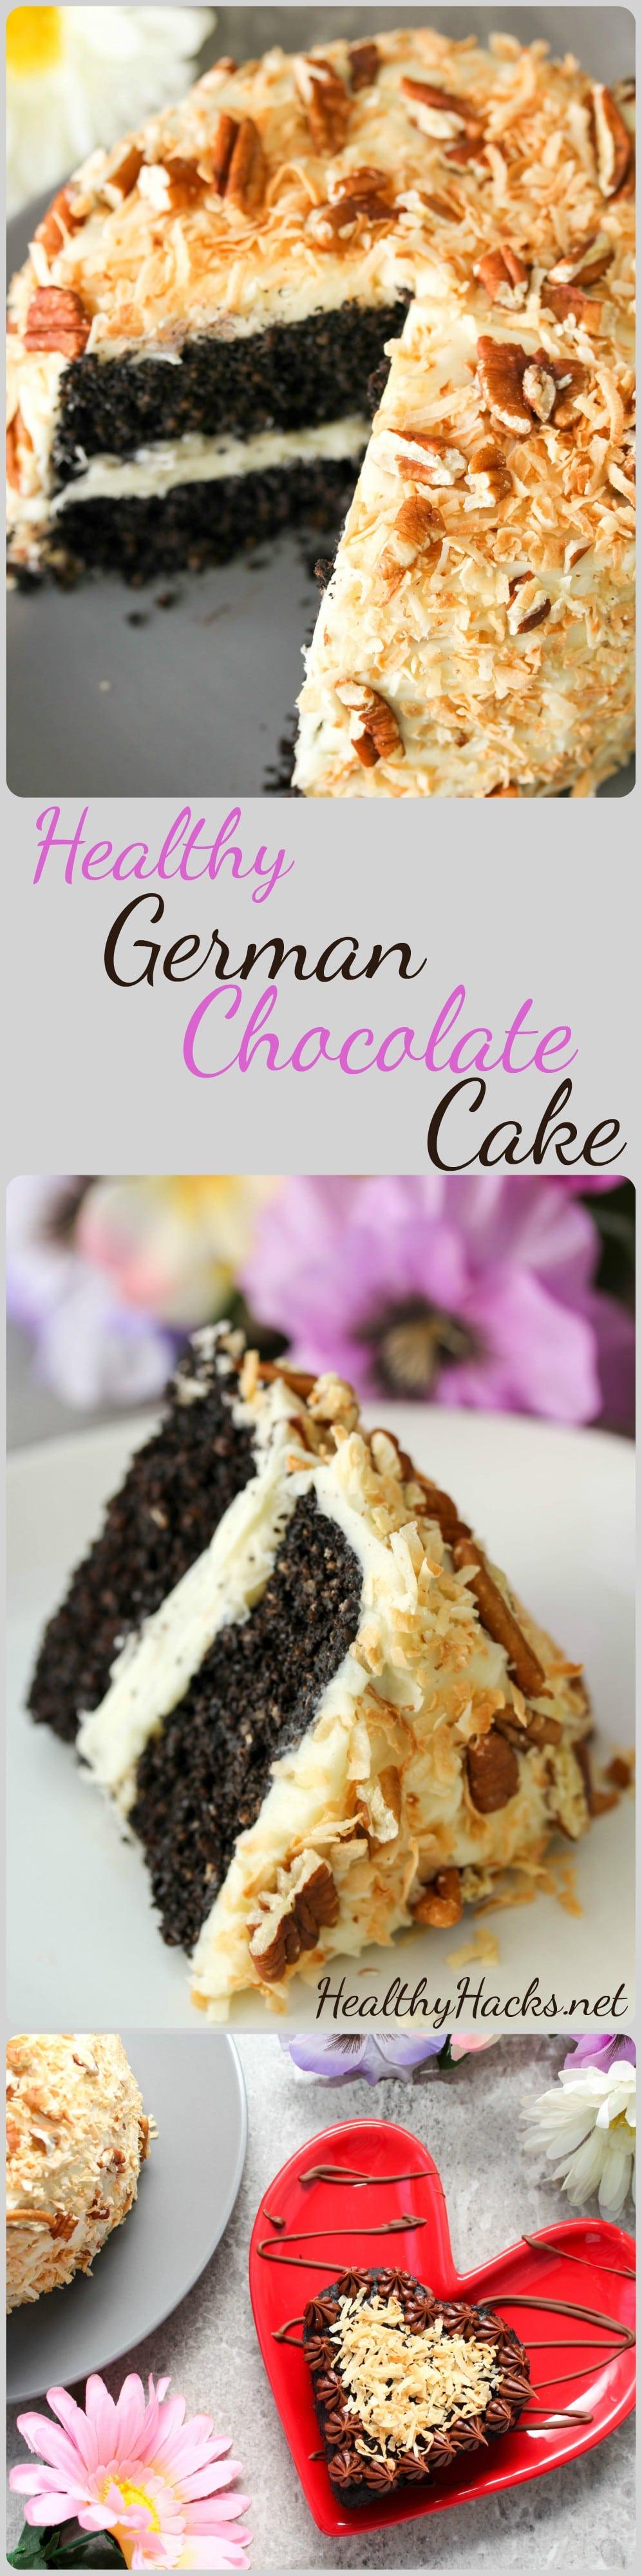 Healthy German Chocolate Cake Vegan; Gluten Free